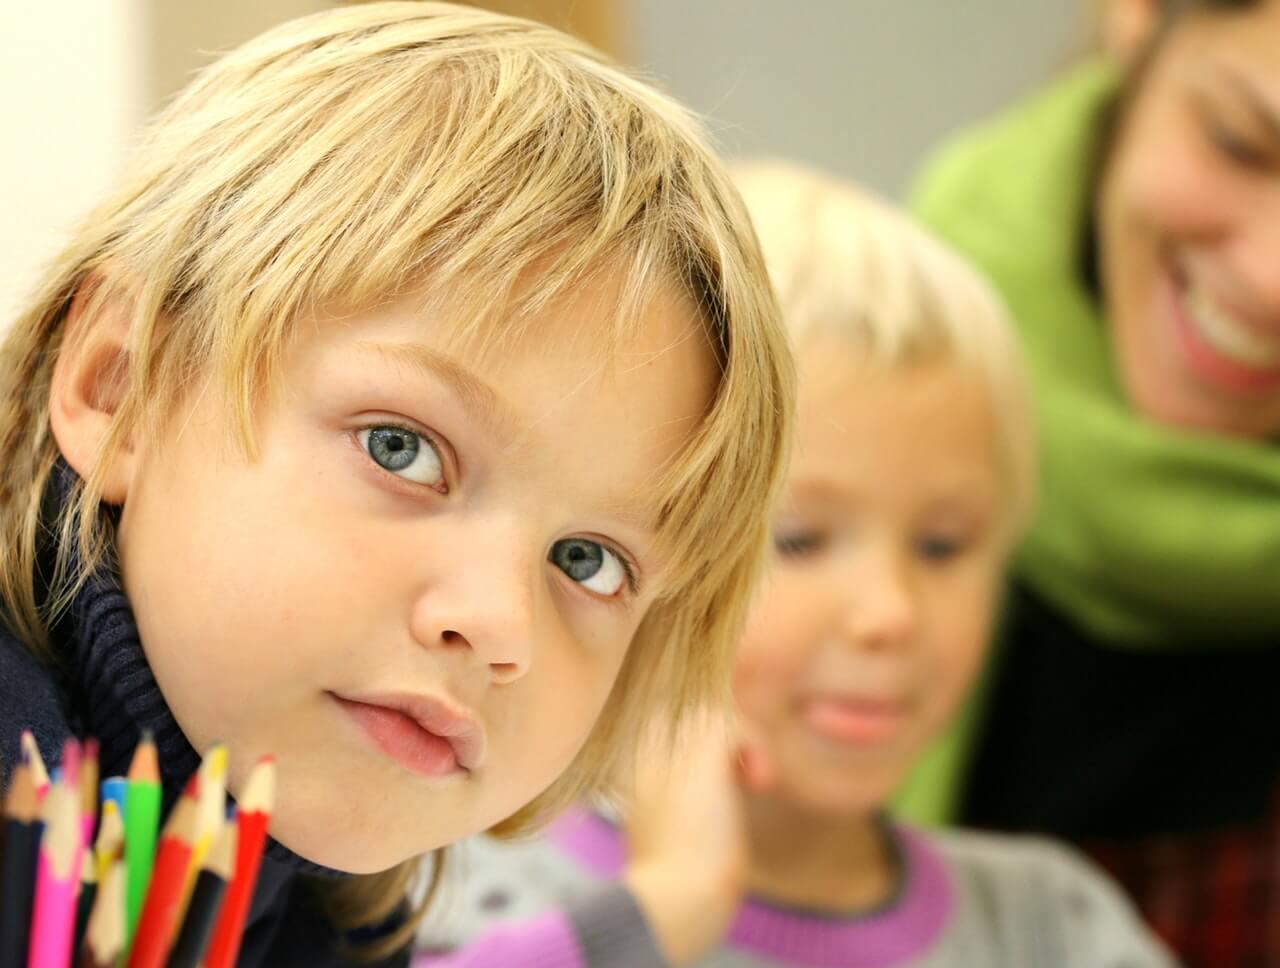 Children-development